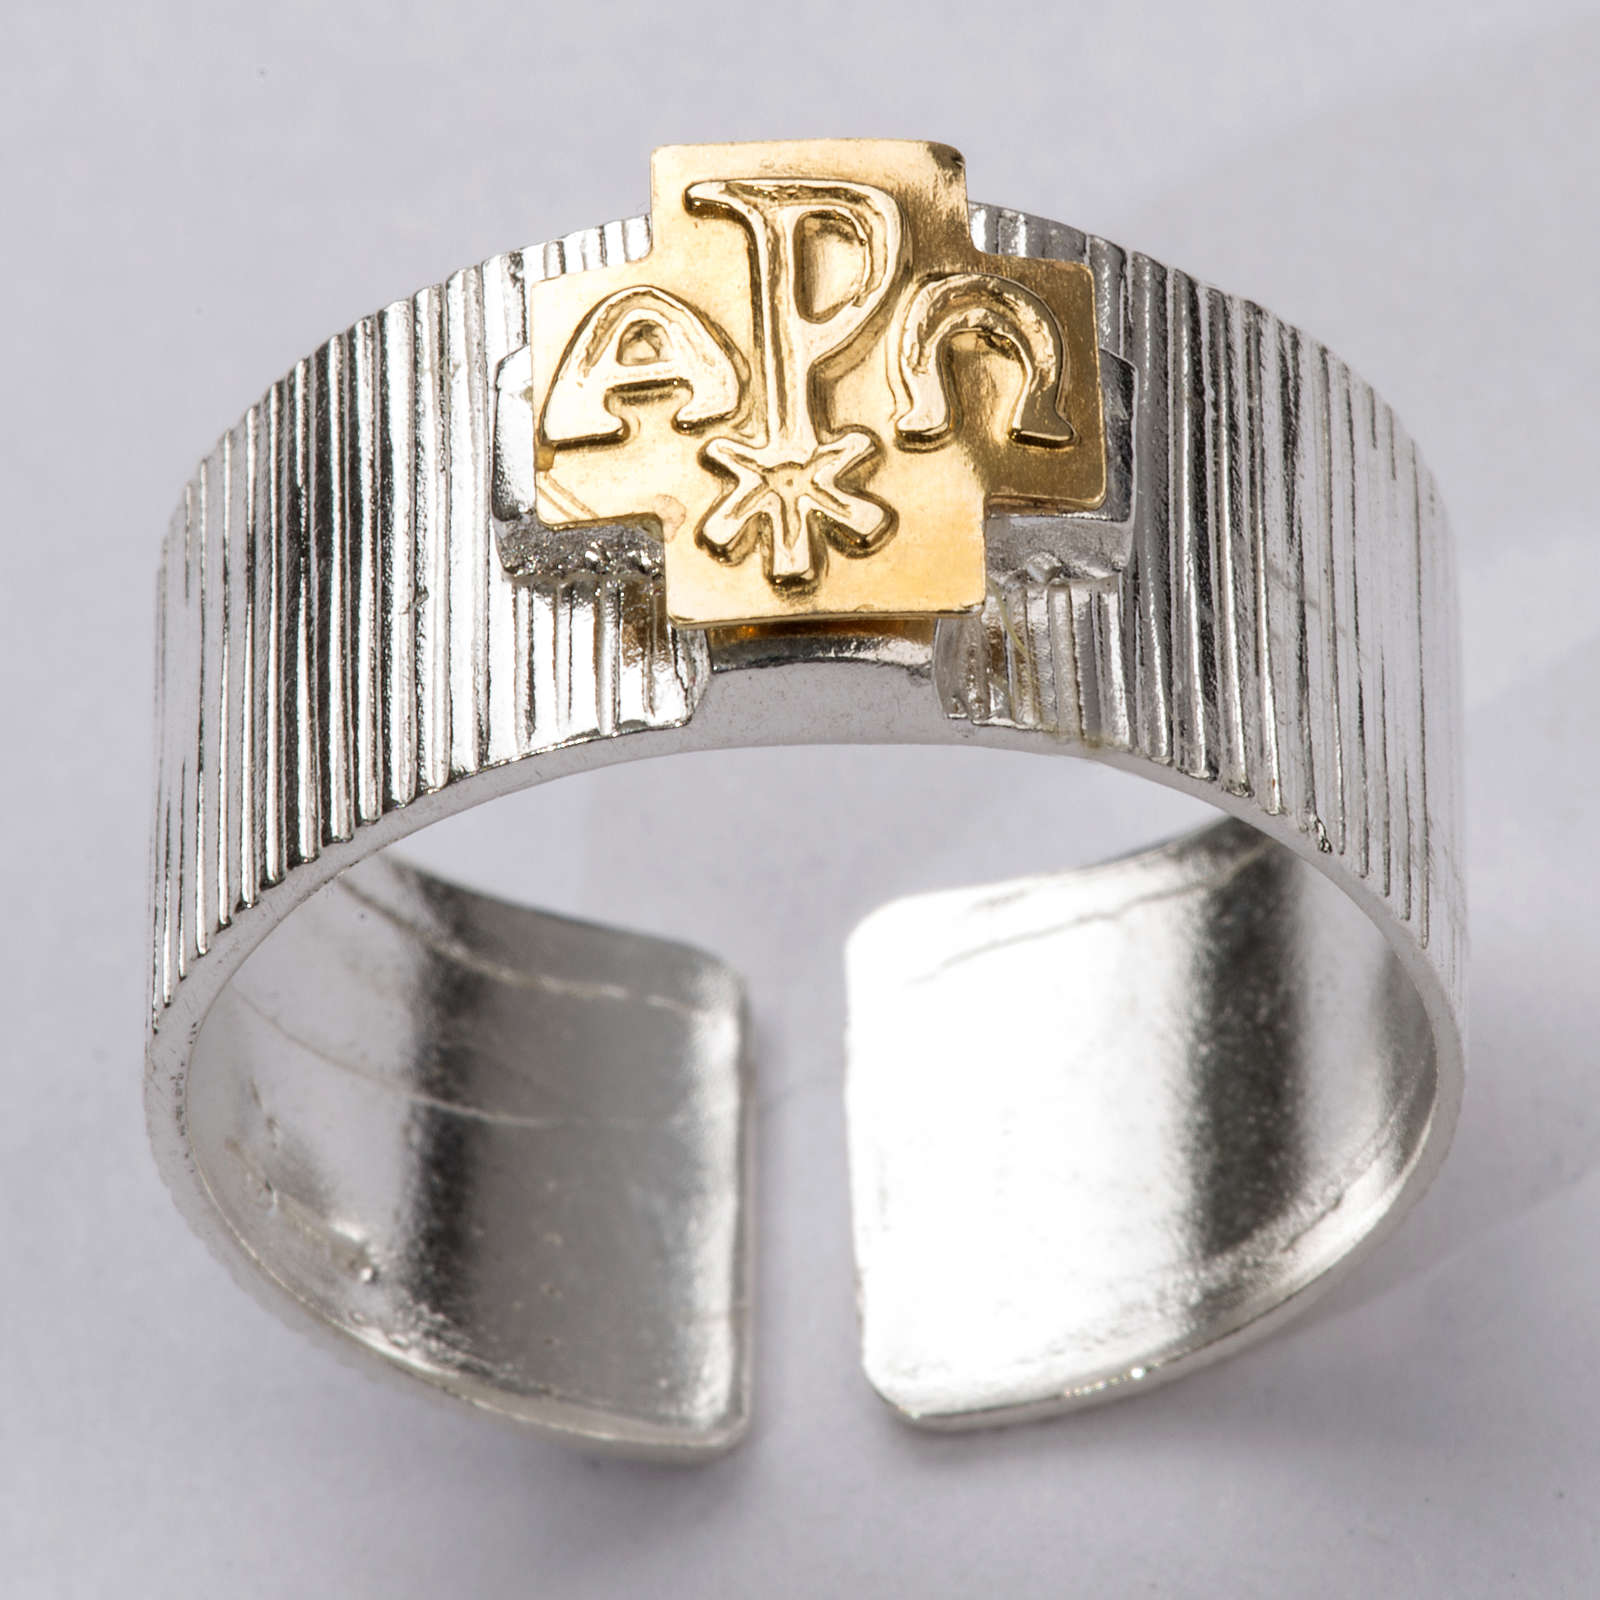 Anel bispo prata 925 cruz alfa ómega Chi-Rho 3